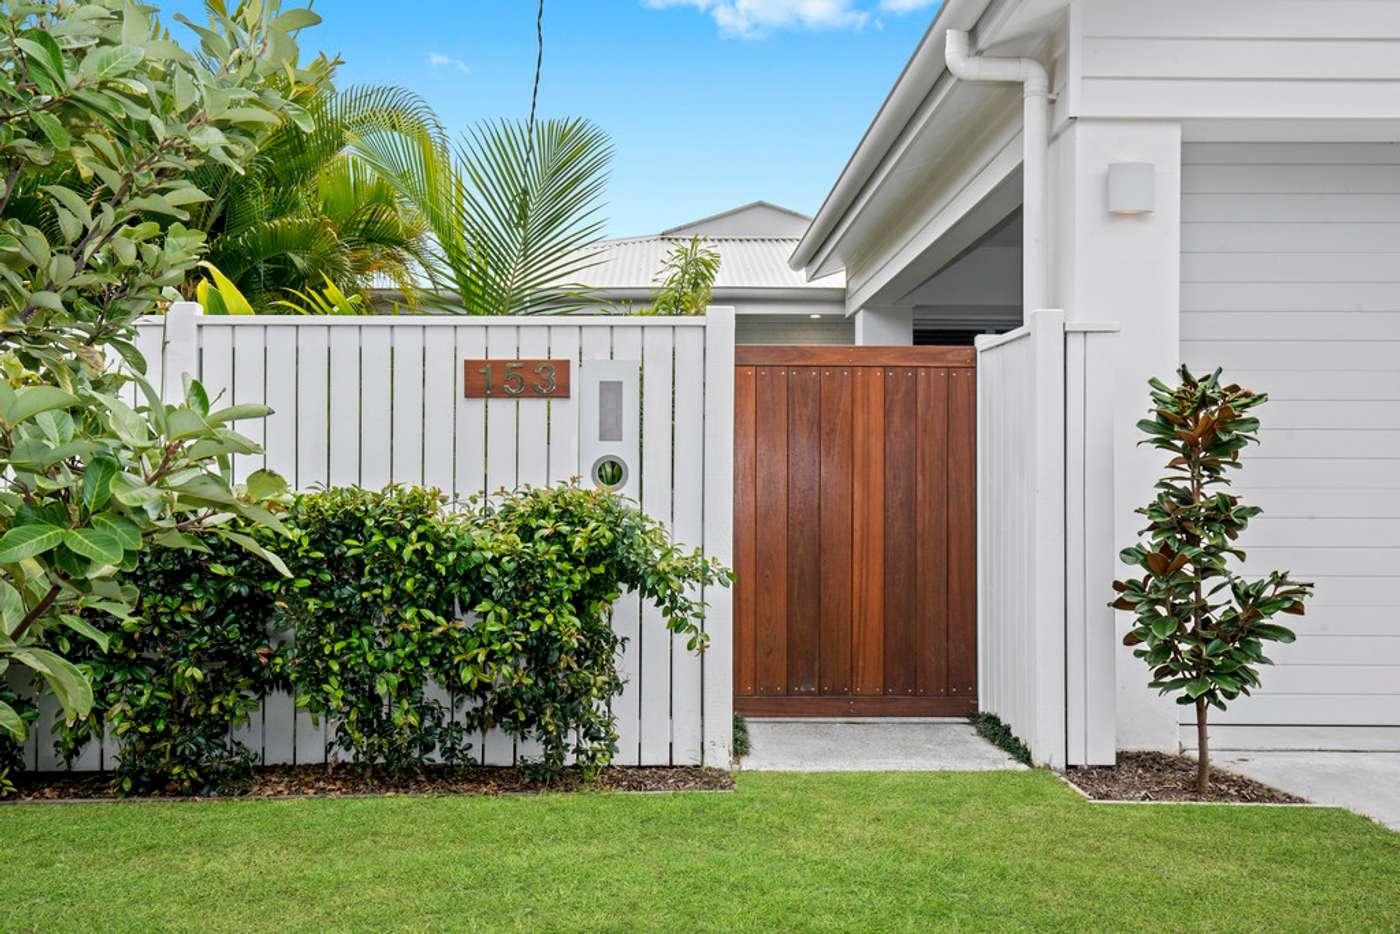 Main view of Homely house listing, 153 Laguna Avenue, Palm Beach QLD 4221